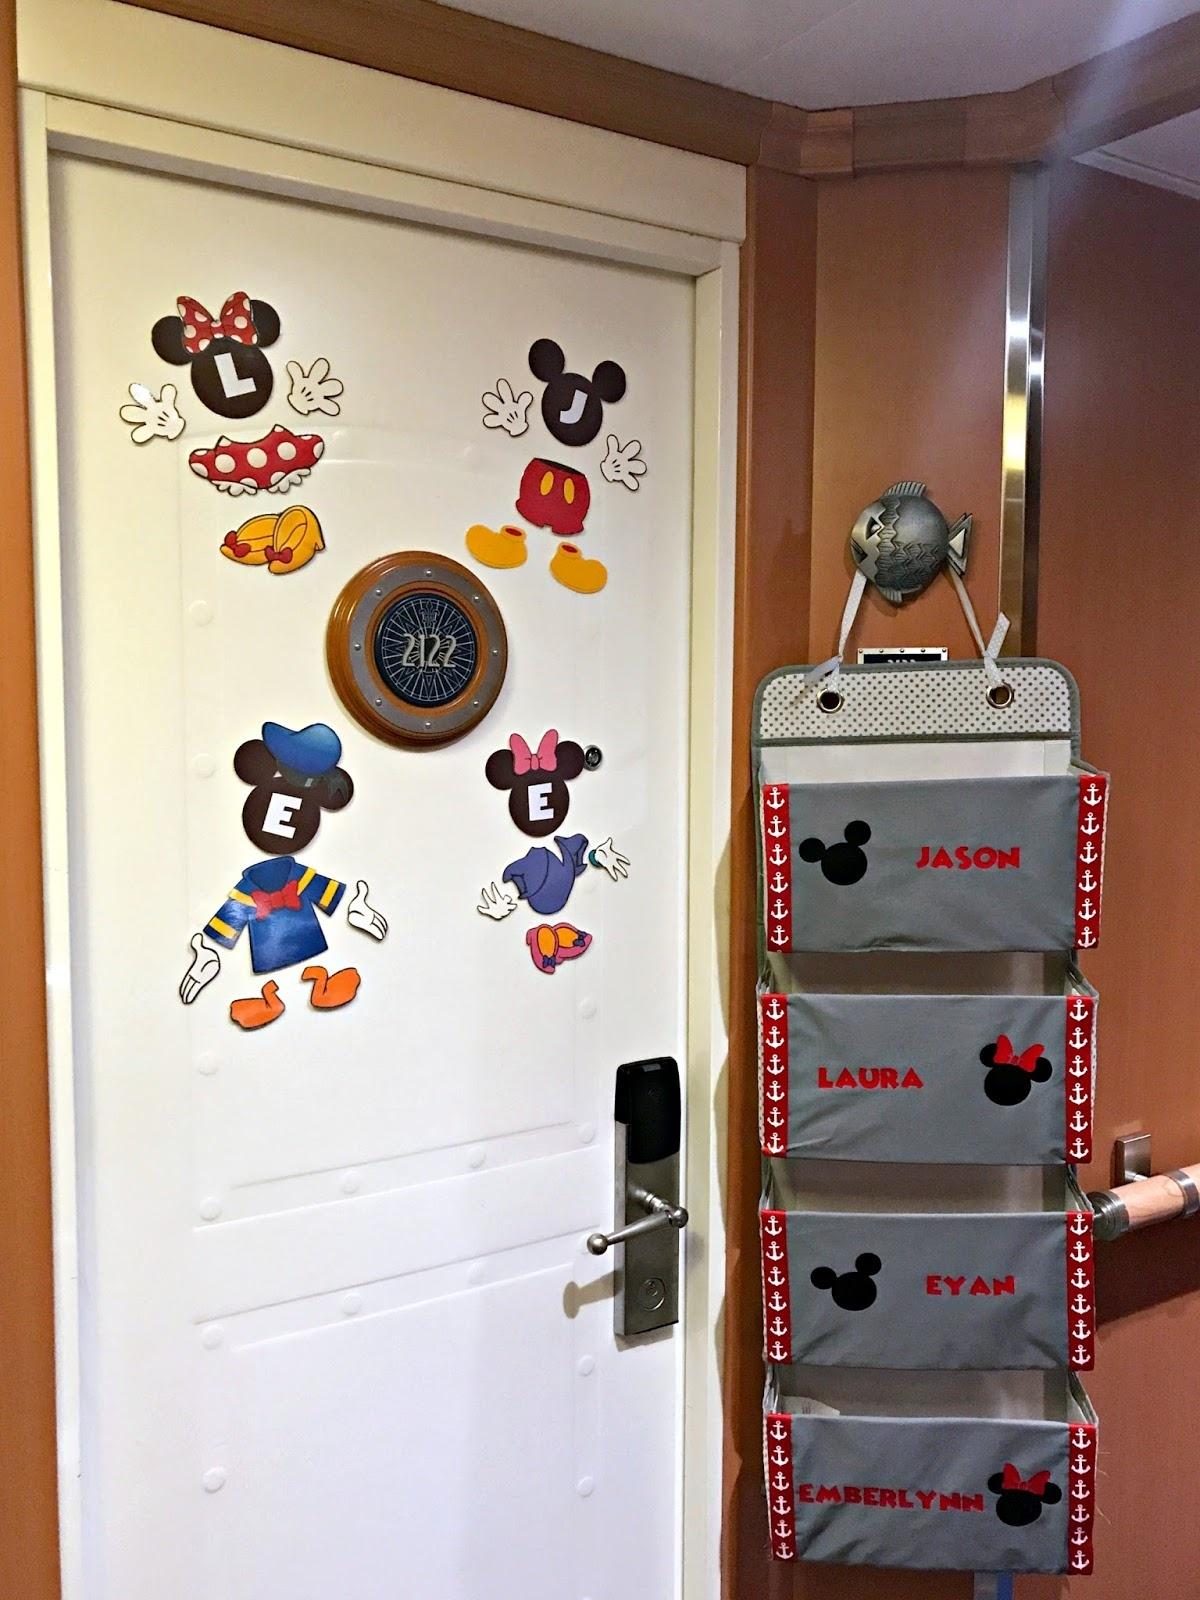 Diy Disney Cruise Door Magnets Printable - We Got The Funk - Free Printable Disney Cruise Door Magnets